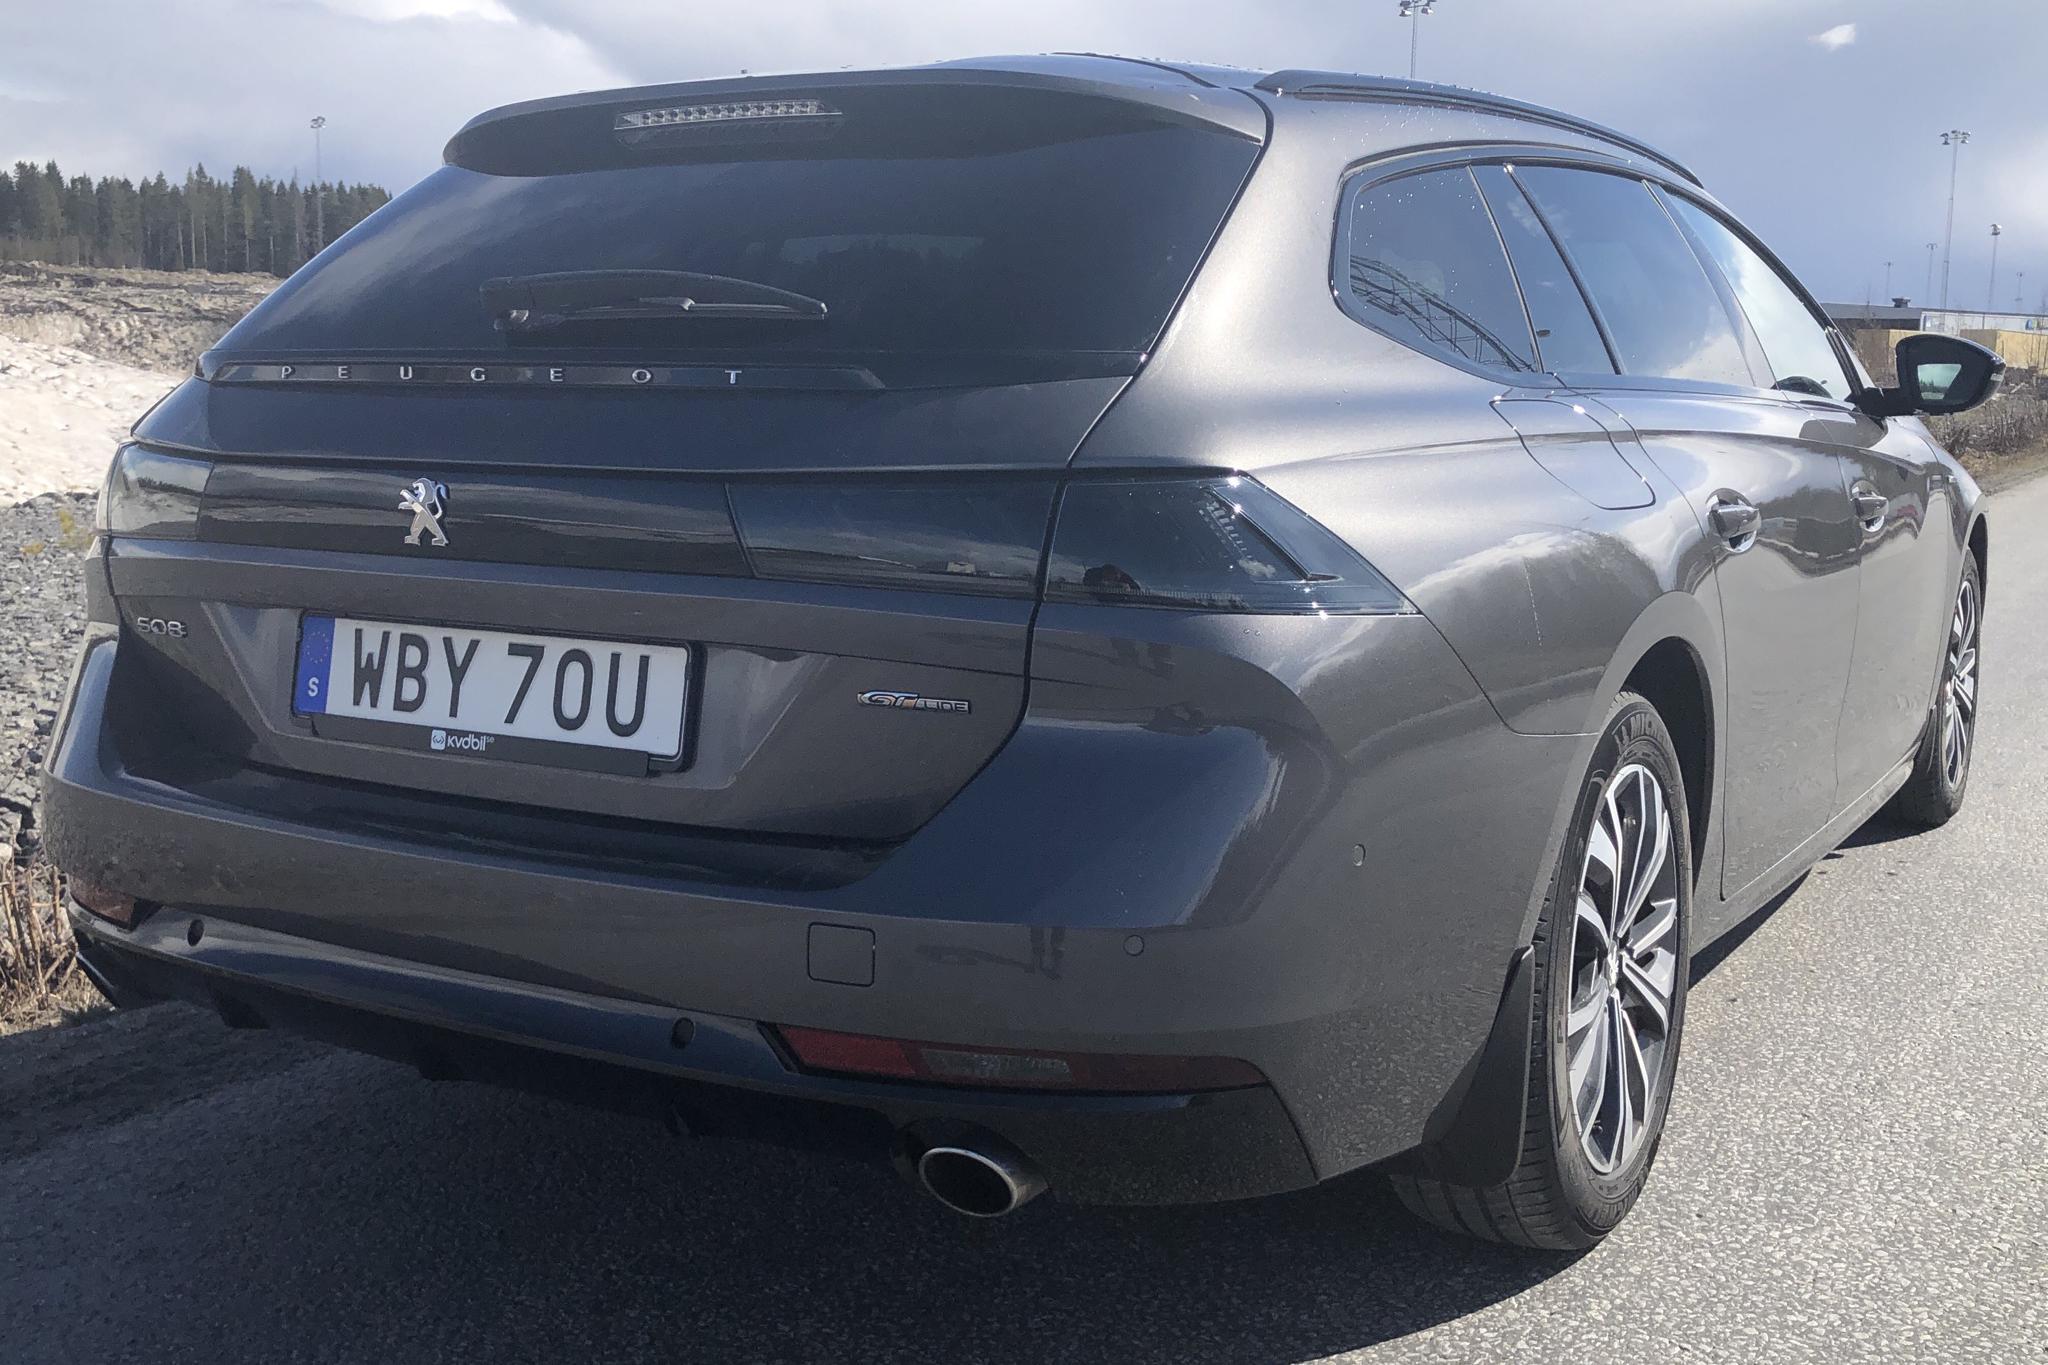 Peugeot 508 1.6 PureTech SW (180hk) - 31 410 km - Automatic - Light Grey - 2019